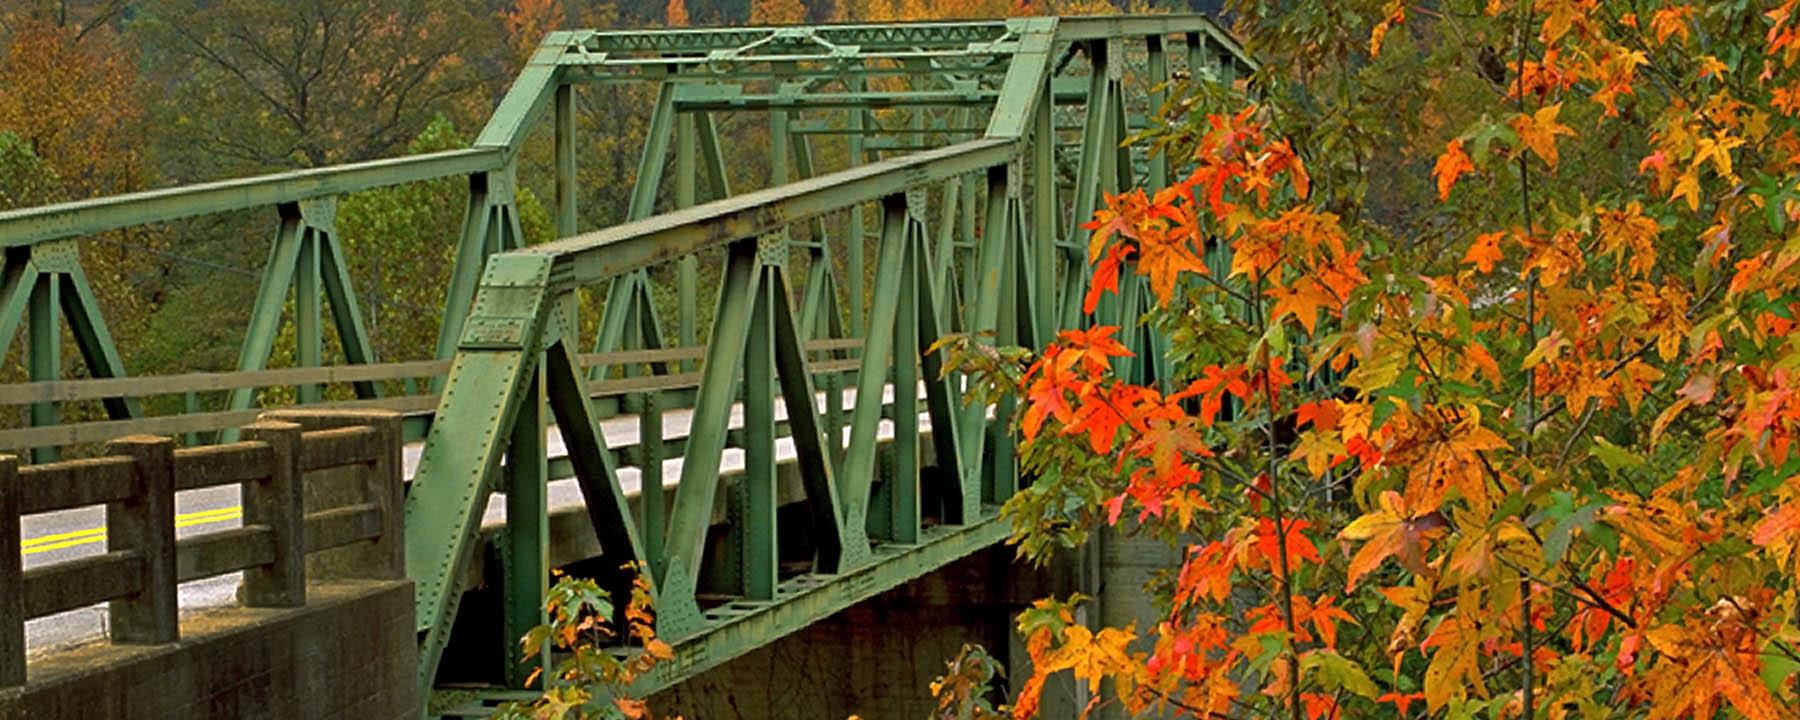 Arkansas-Good-Roads-Foundation-Contact-Us-Image